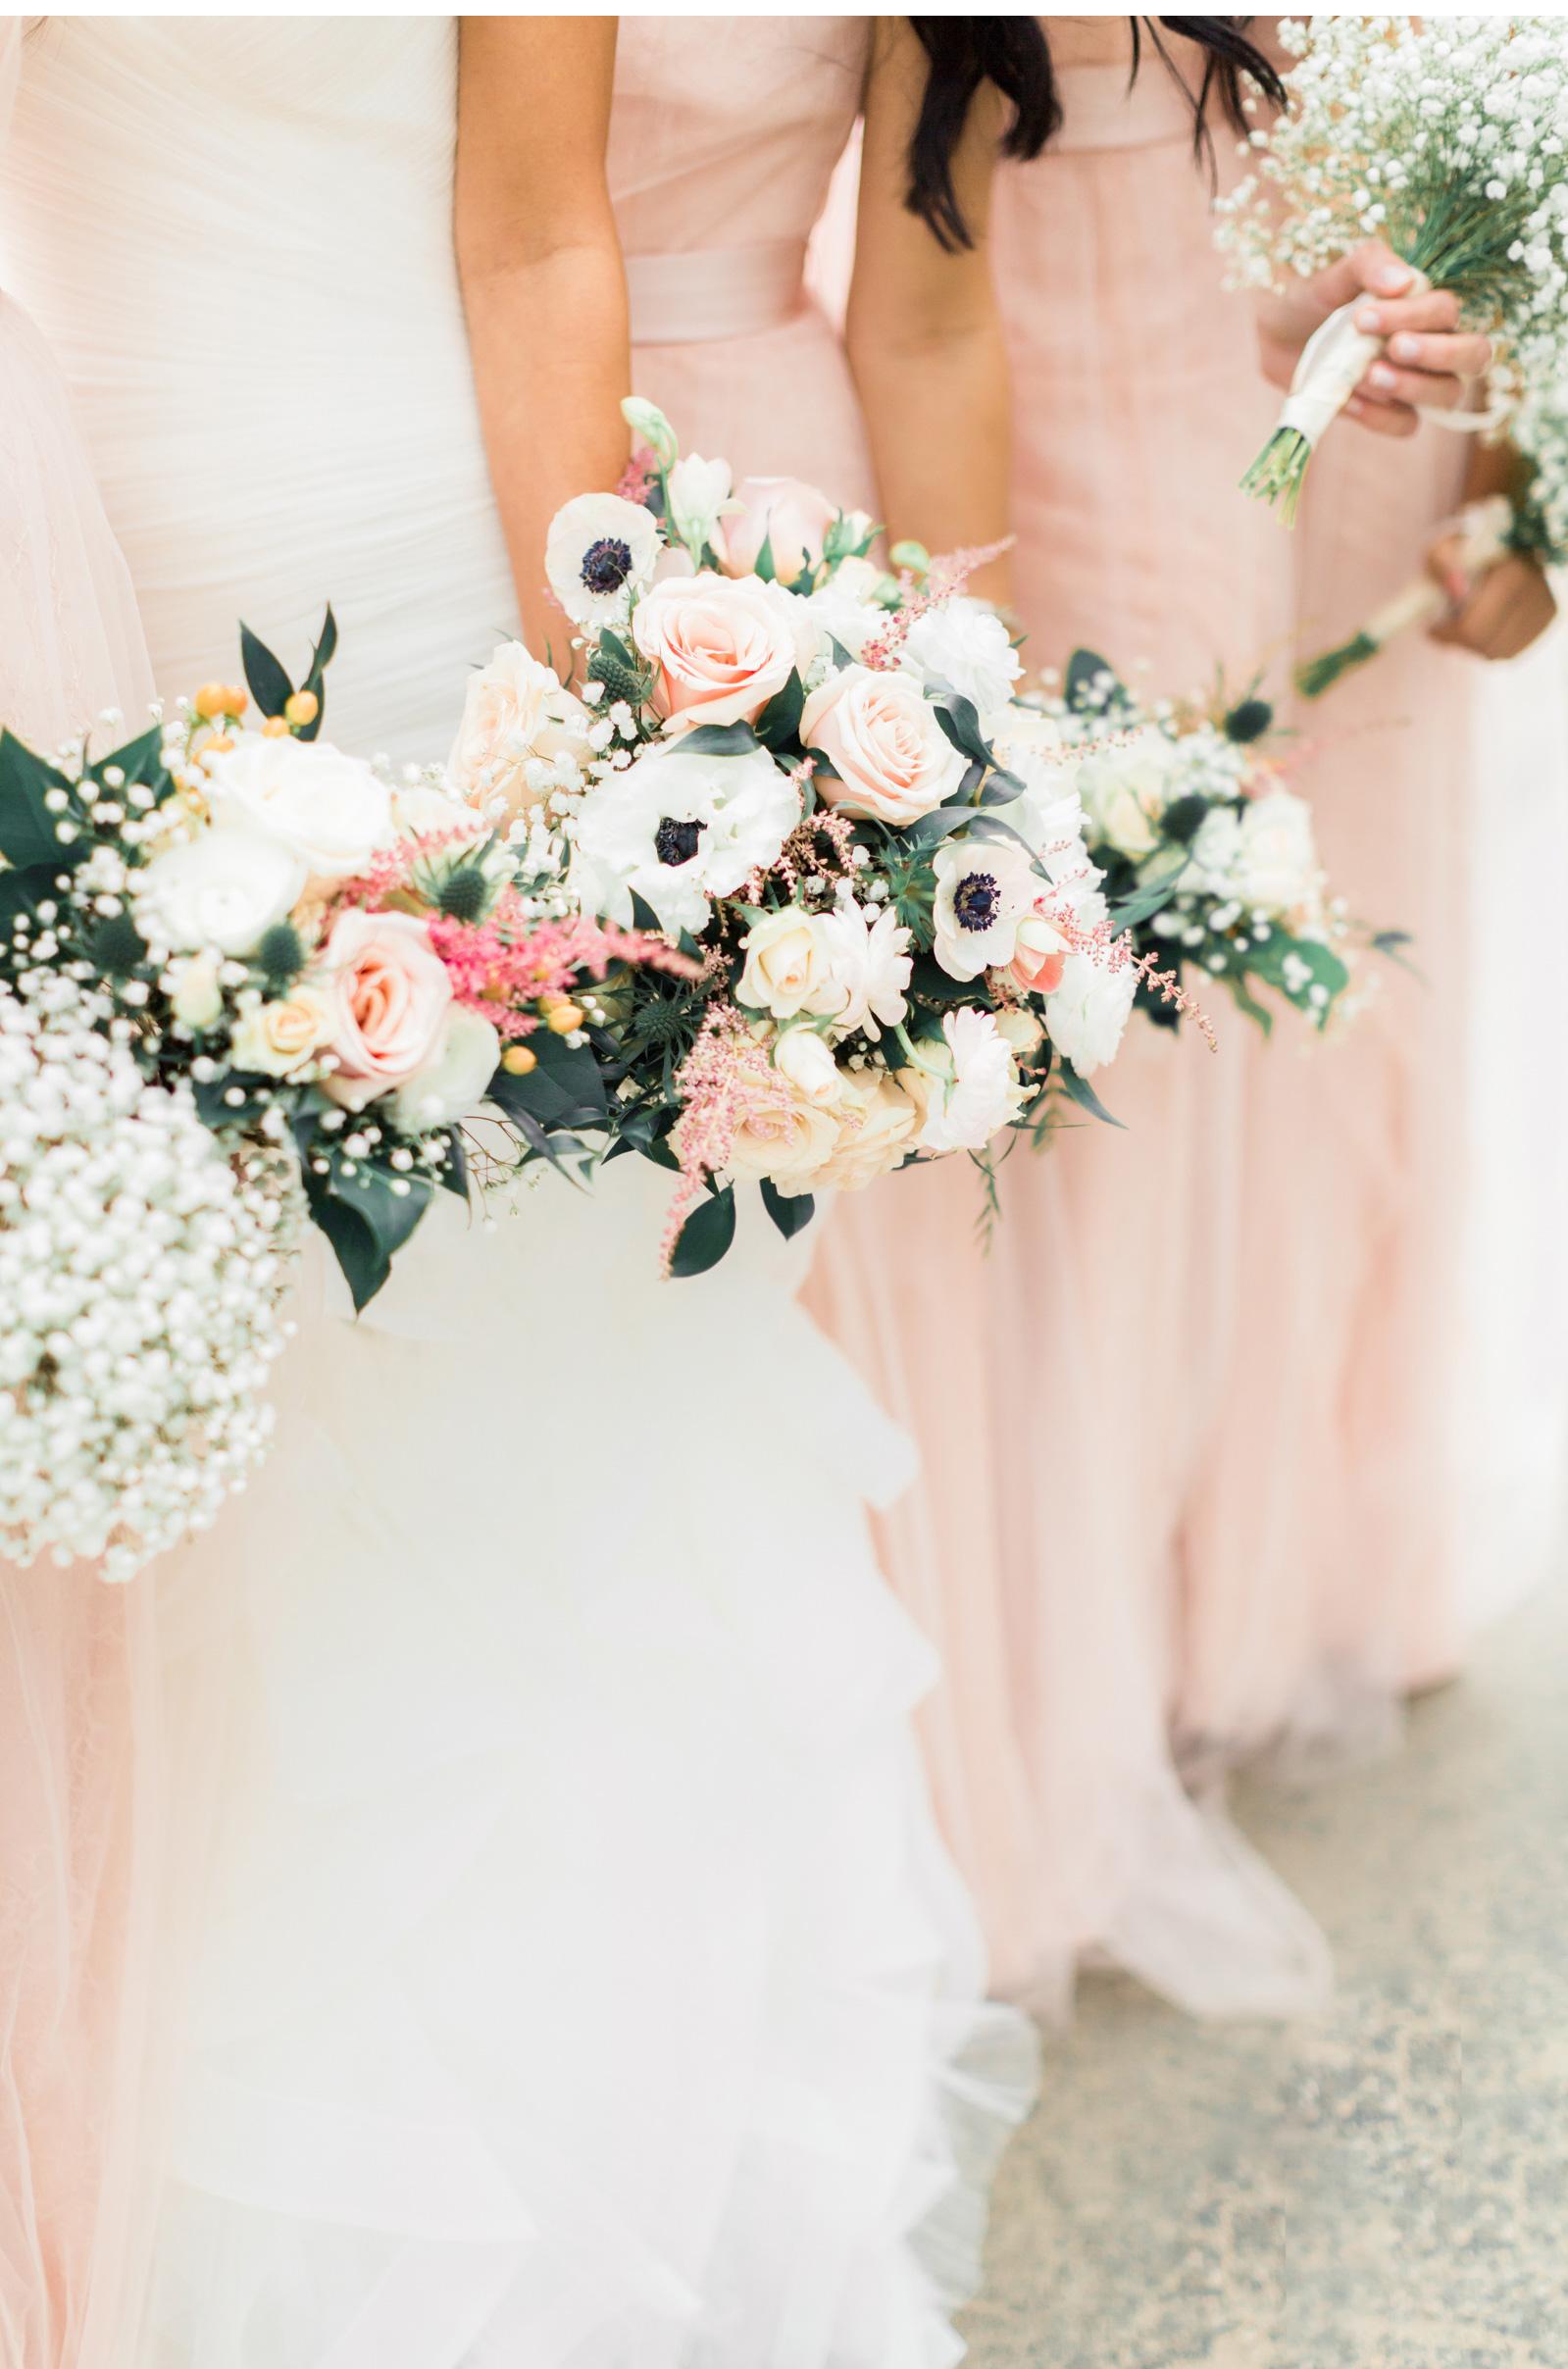 Rod-and-Lorin-Brewster-Style-Me-Pretty-Malibu-Beach-Wedding-Natalie-Schutt-Photography_11.jpg